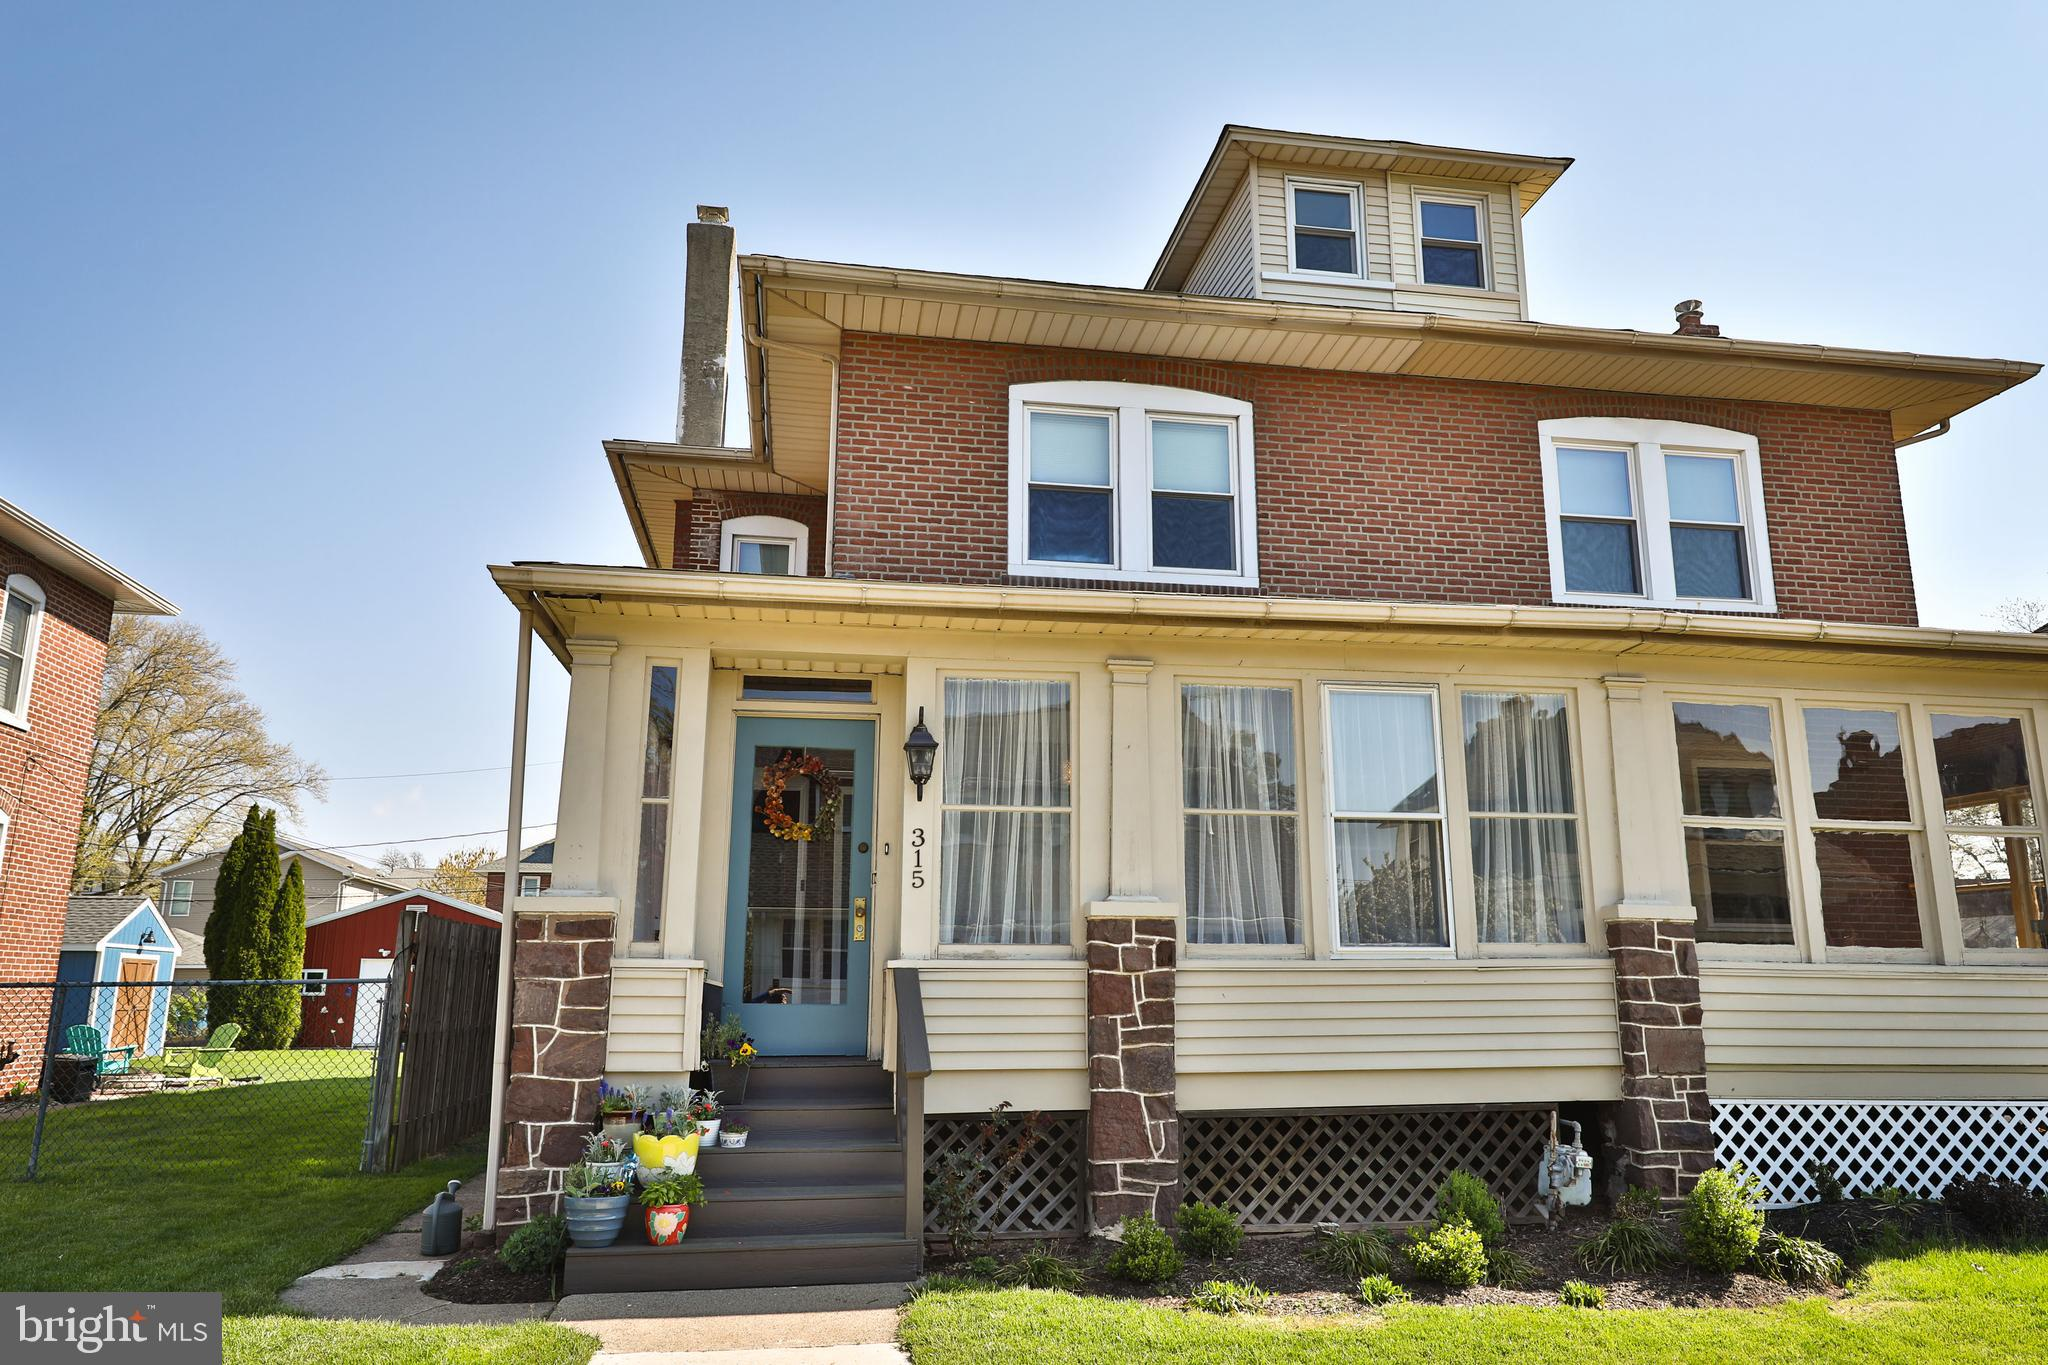 315 DELAWARE AVENUE, LANSDALE, Pennsylvania 19446, 3 Bedrooms Bedrooms, ,2 BathroomsBathrooms,Townhouse,For Sale,315 DELAWARE AVENUE,PAMC690706